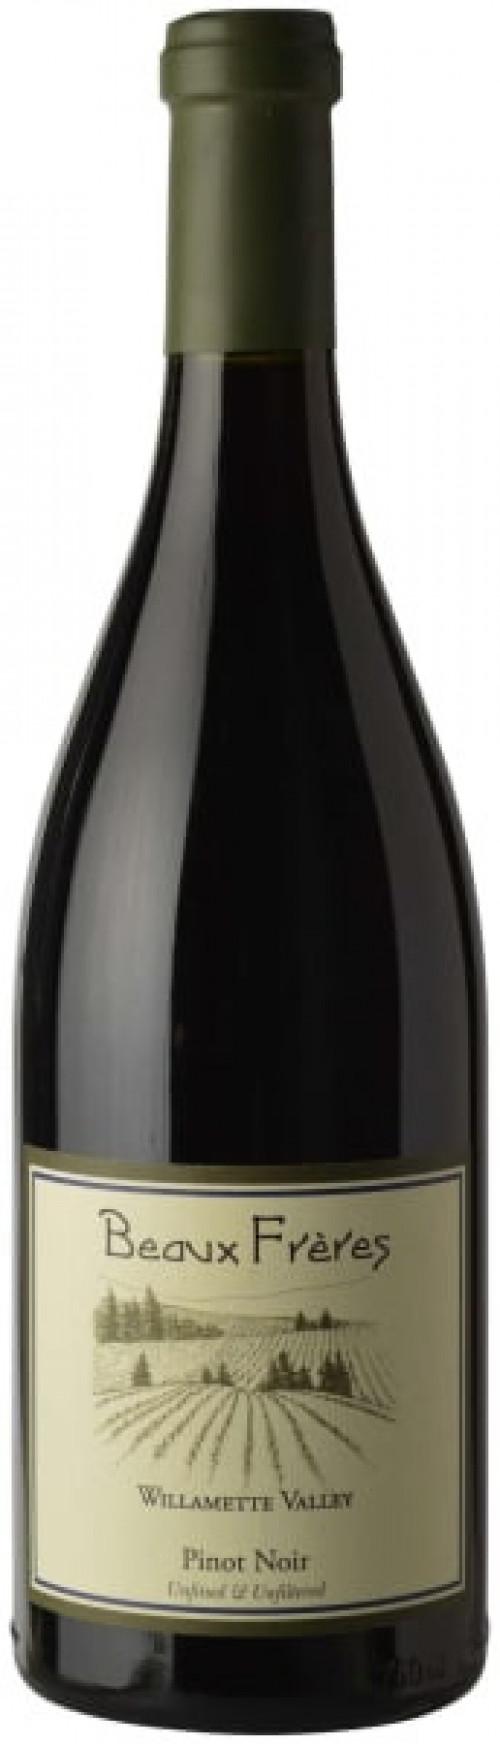 2019 Beaux Freres Willamette Valley Pinot Noir 750ml